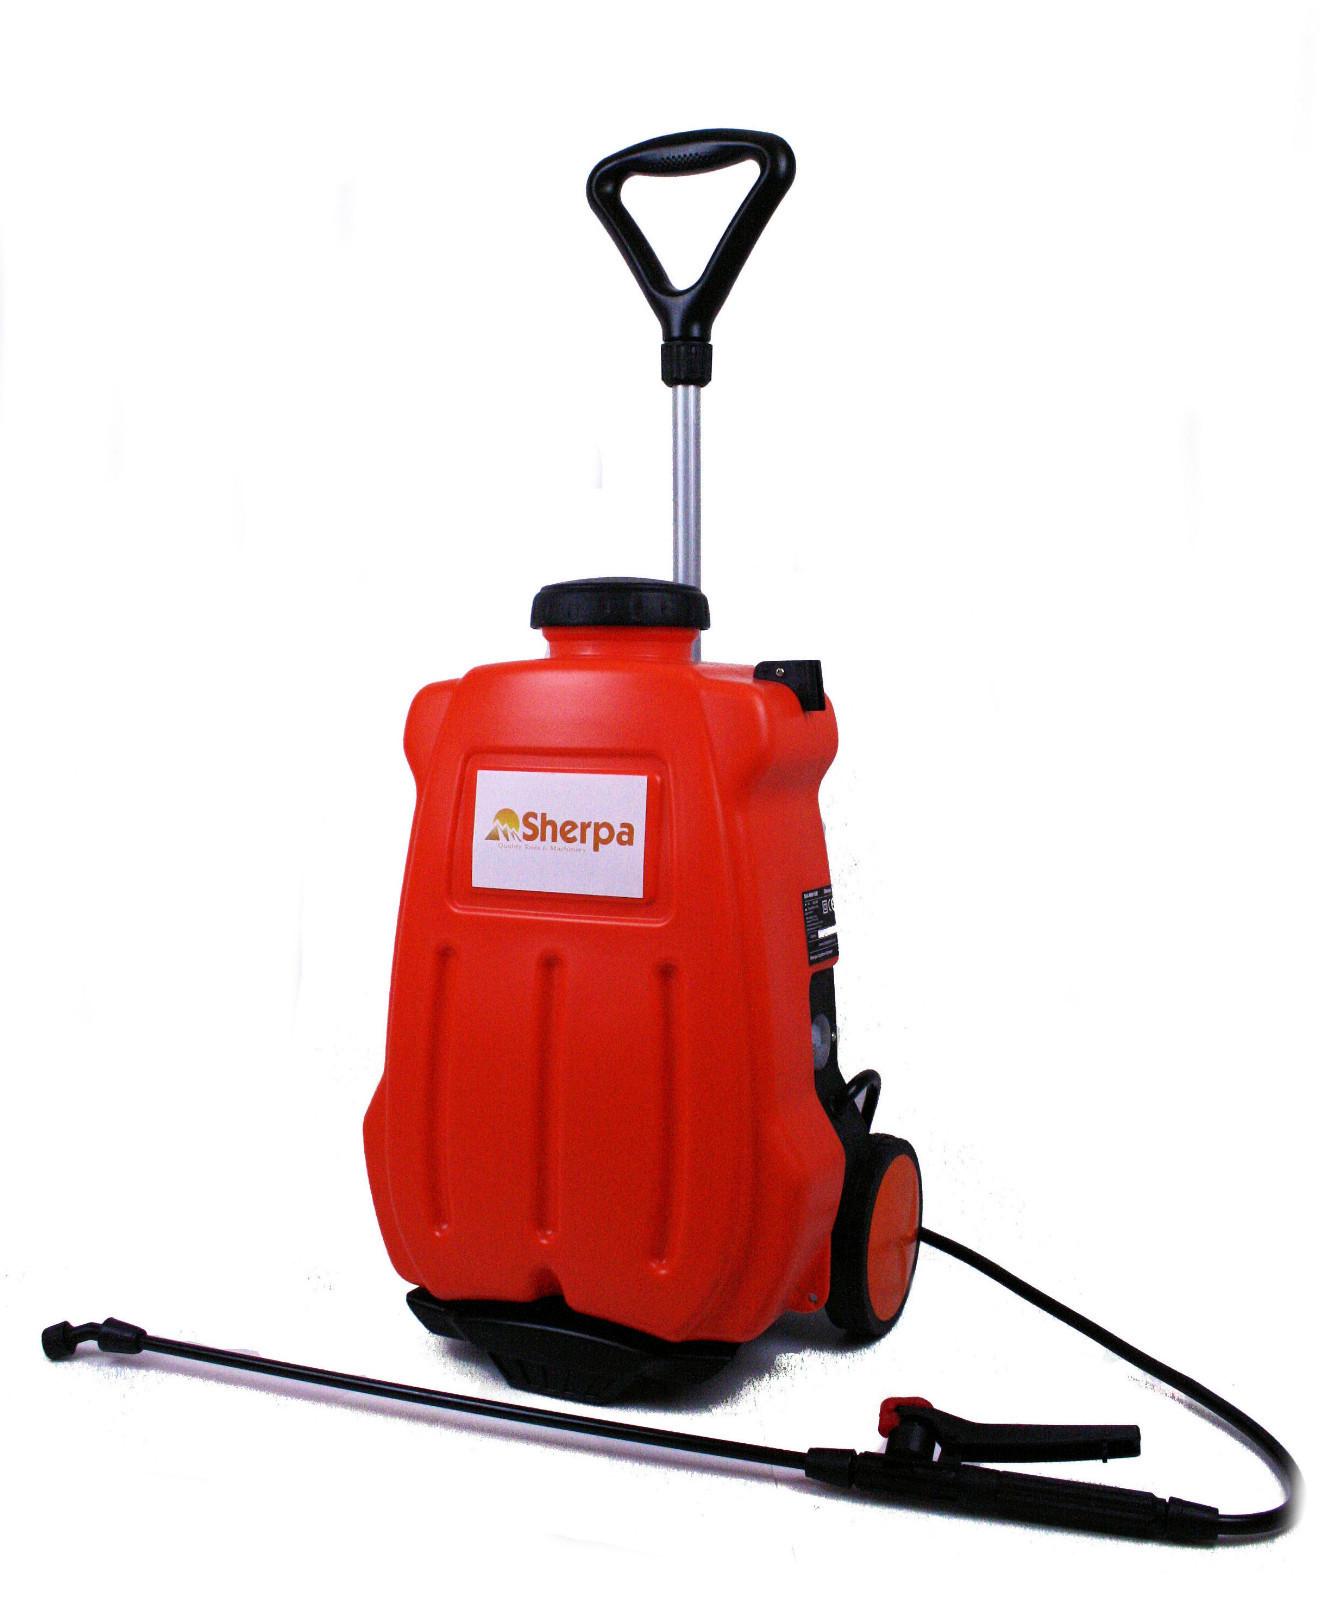 Sherpa Deluxe Multi Sprayer Cordless Powered Knapsack Combi Marketing Ltd Authorised Robomow